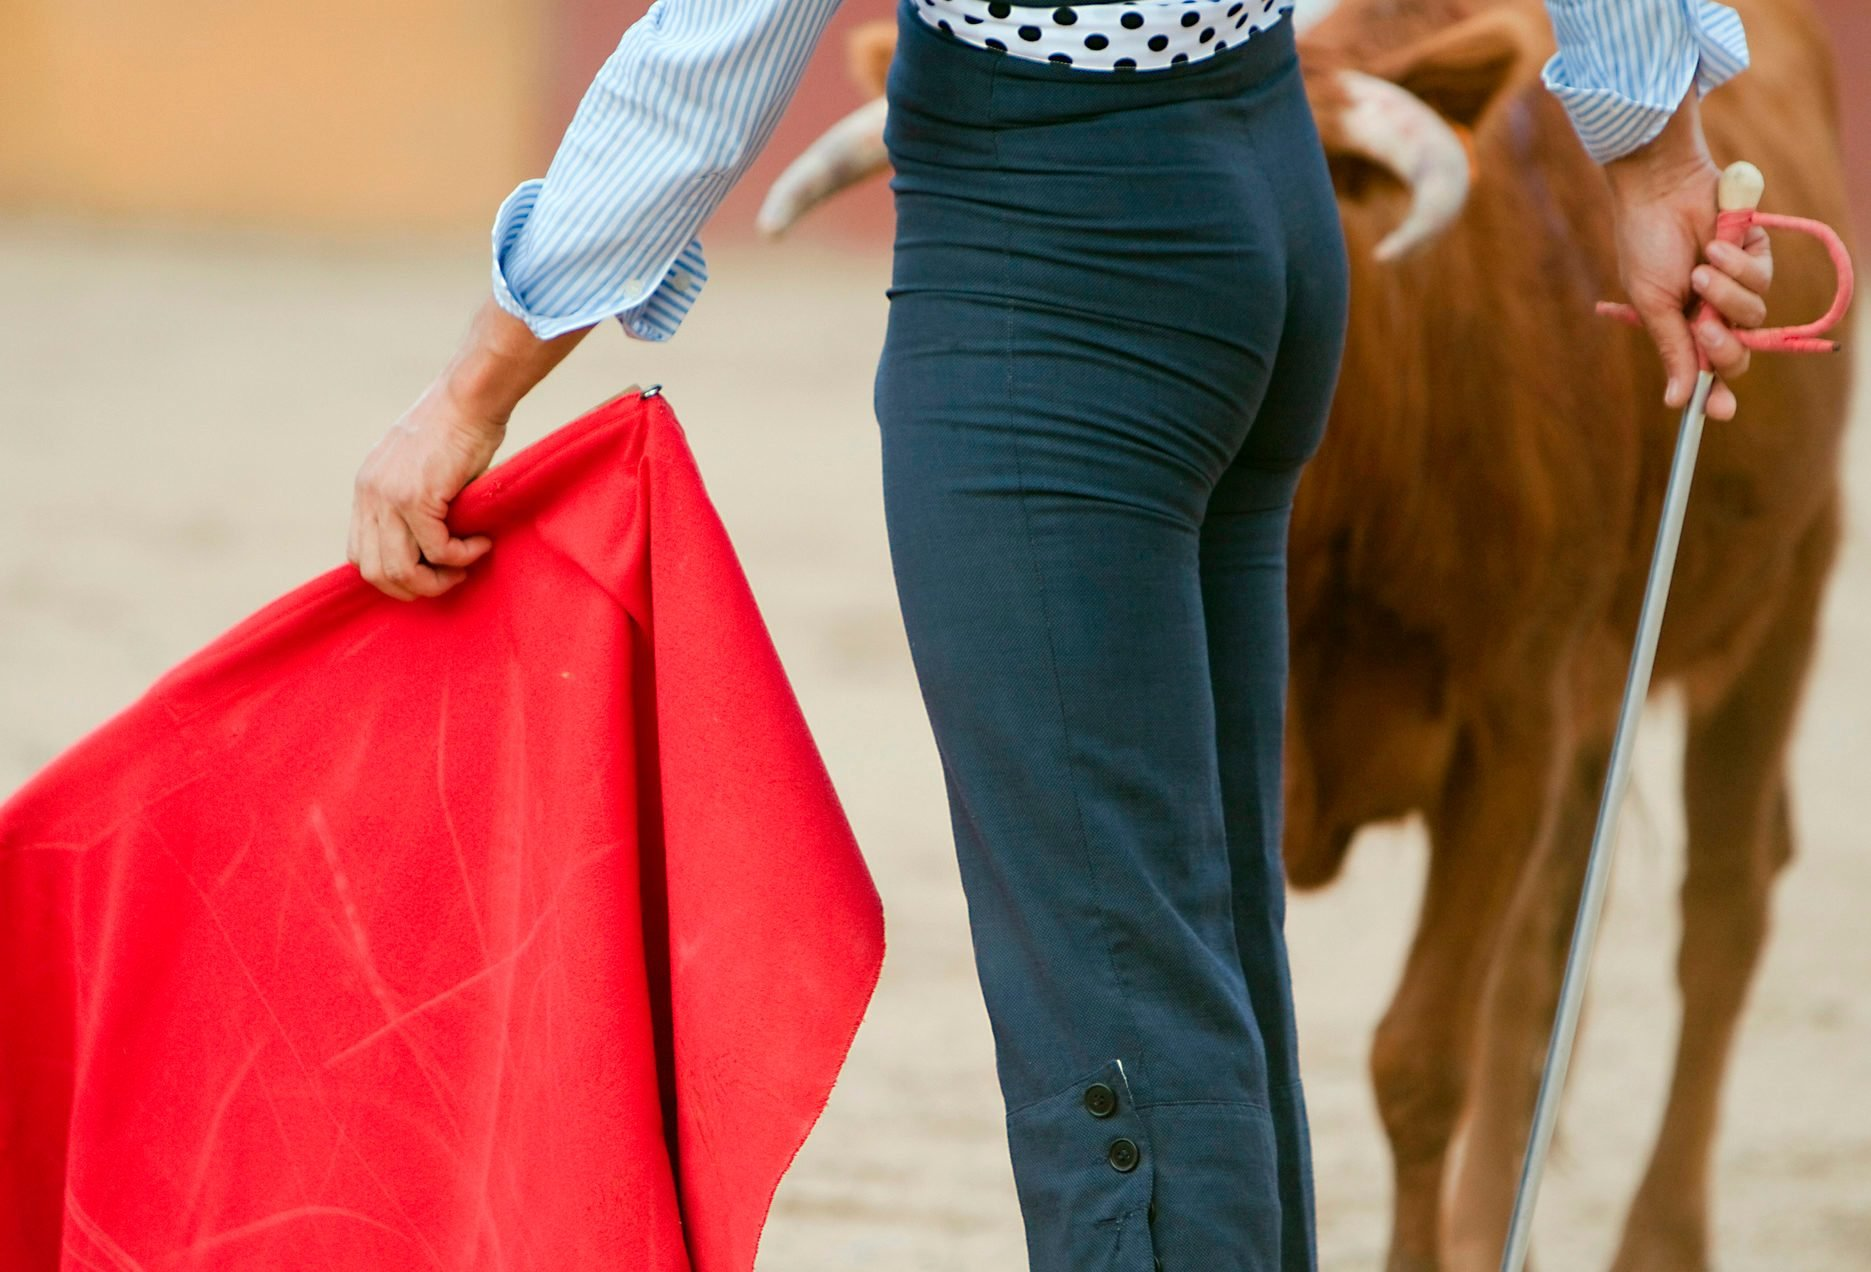 The Spanish bullfighter